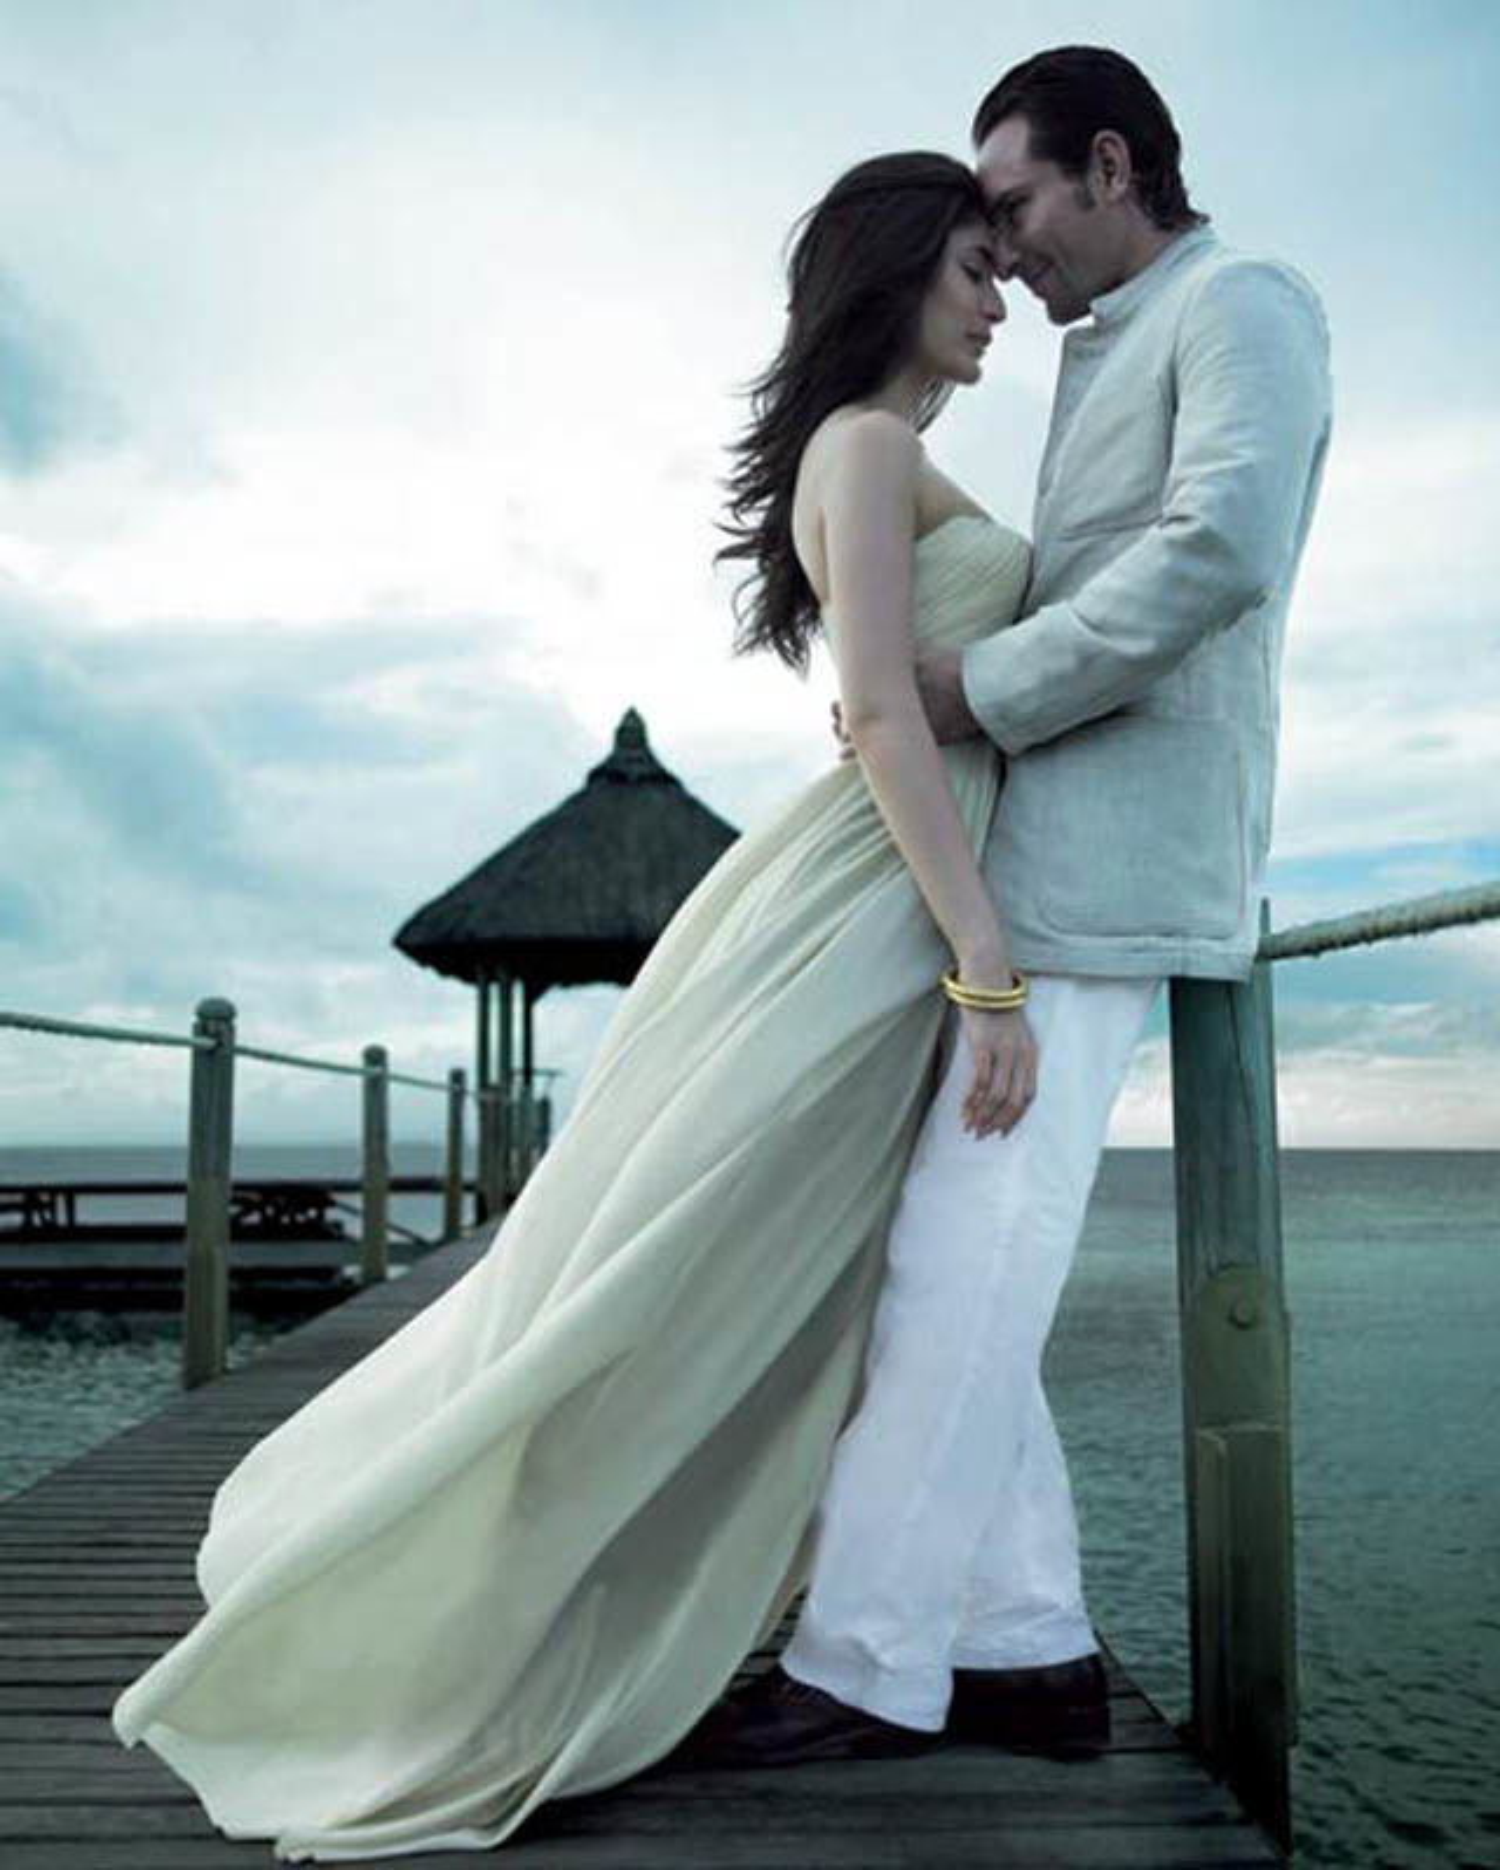 Kareena Kapoor Saif Ali Khan Movie Saif Ali Khan Kareena Kapoor